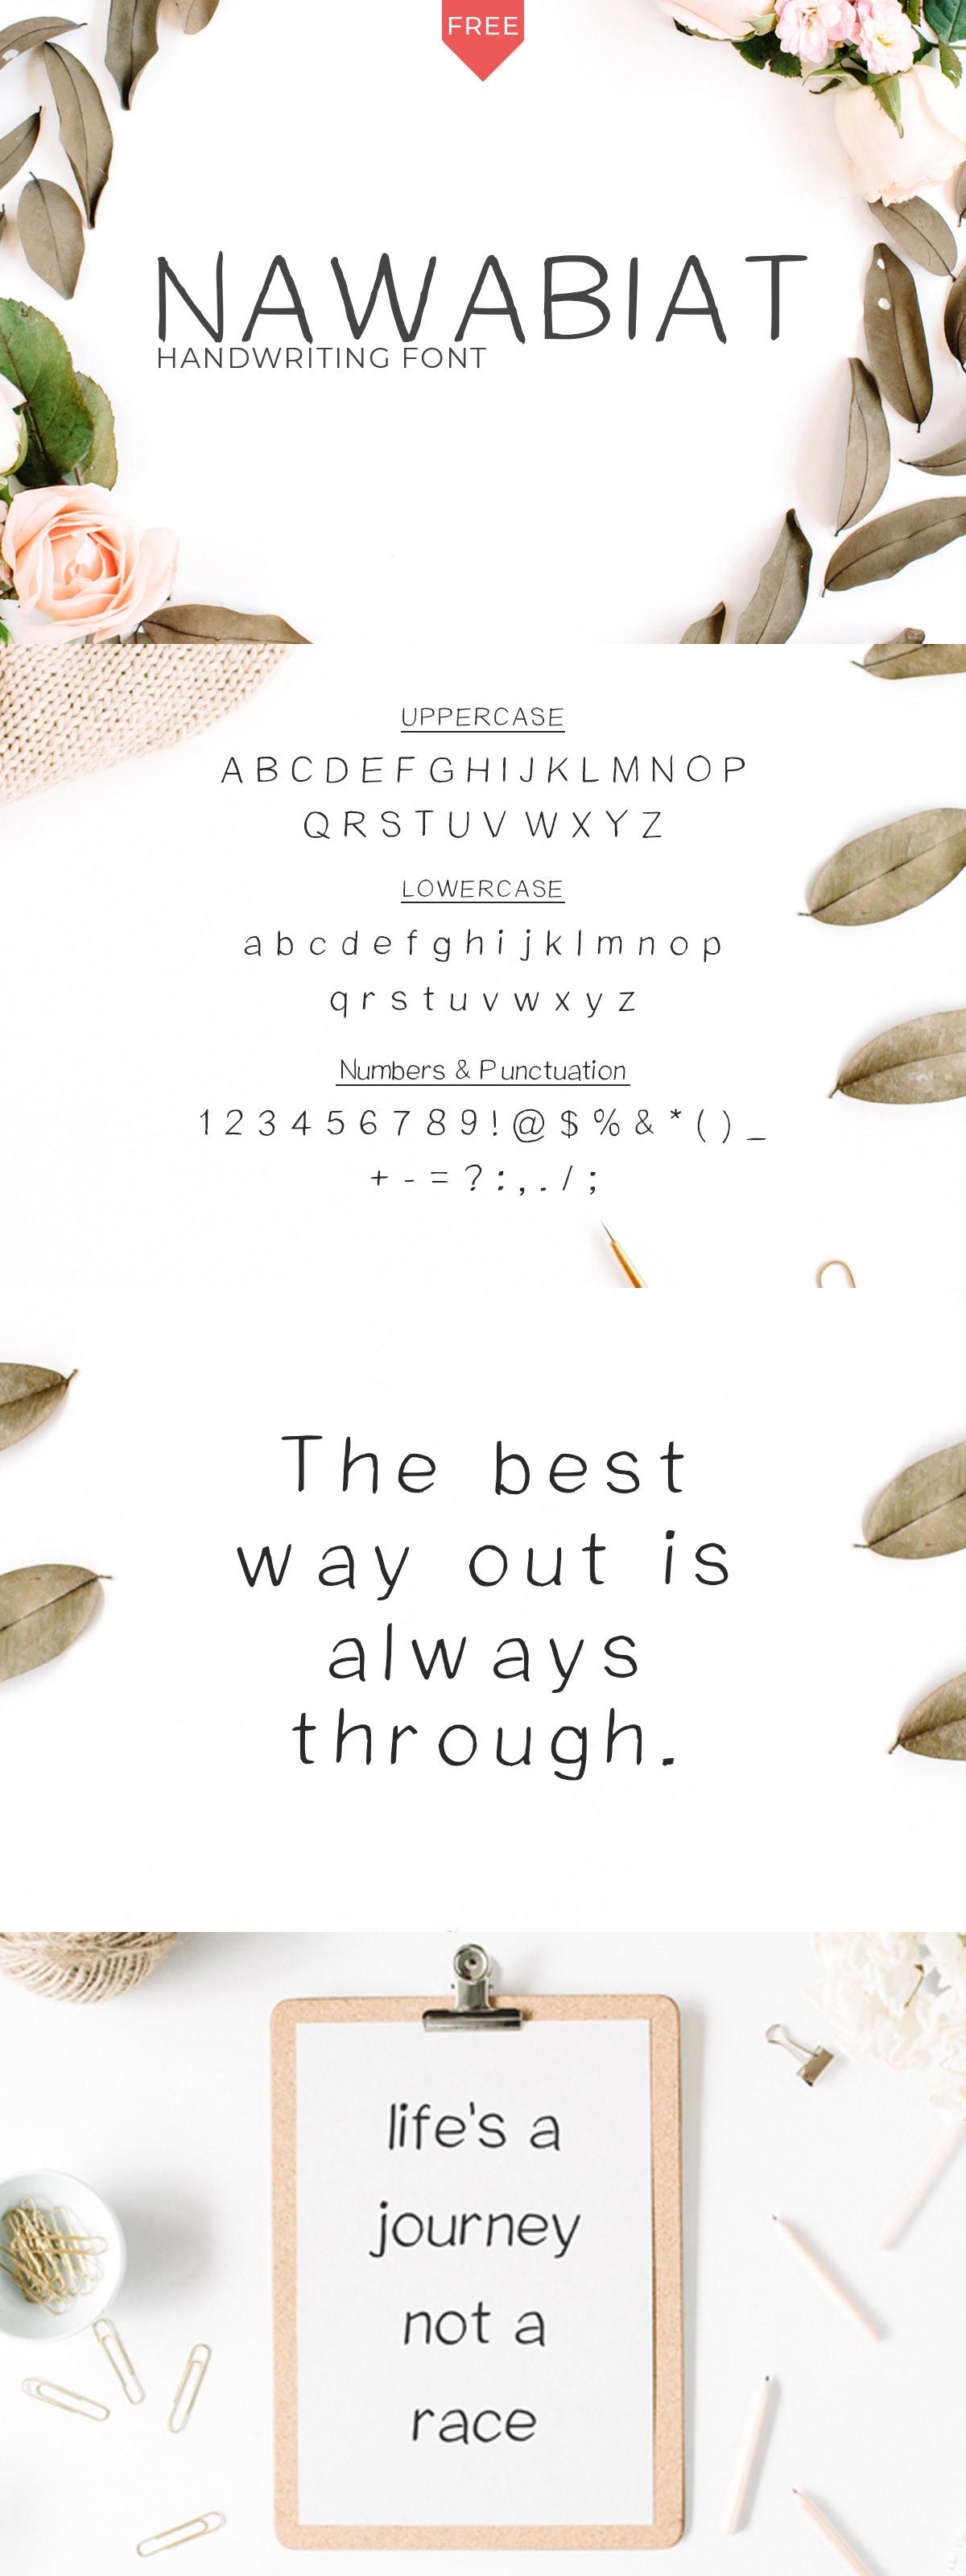 handmade font,Free font,premium font free,handwriting font,typography font,website font,hand made fonts,fonts,freeware fonts,script fonts,Calligraphy fonts,Grunge fonts,font,free,design font